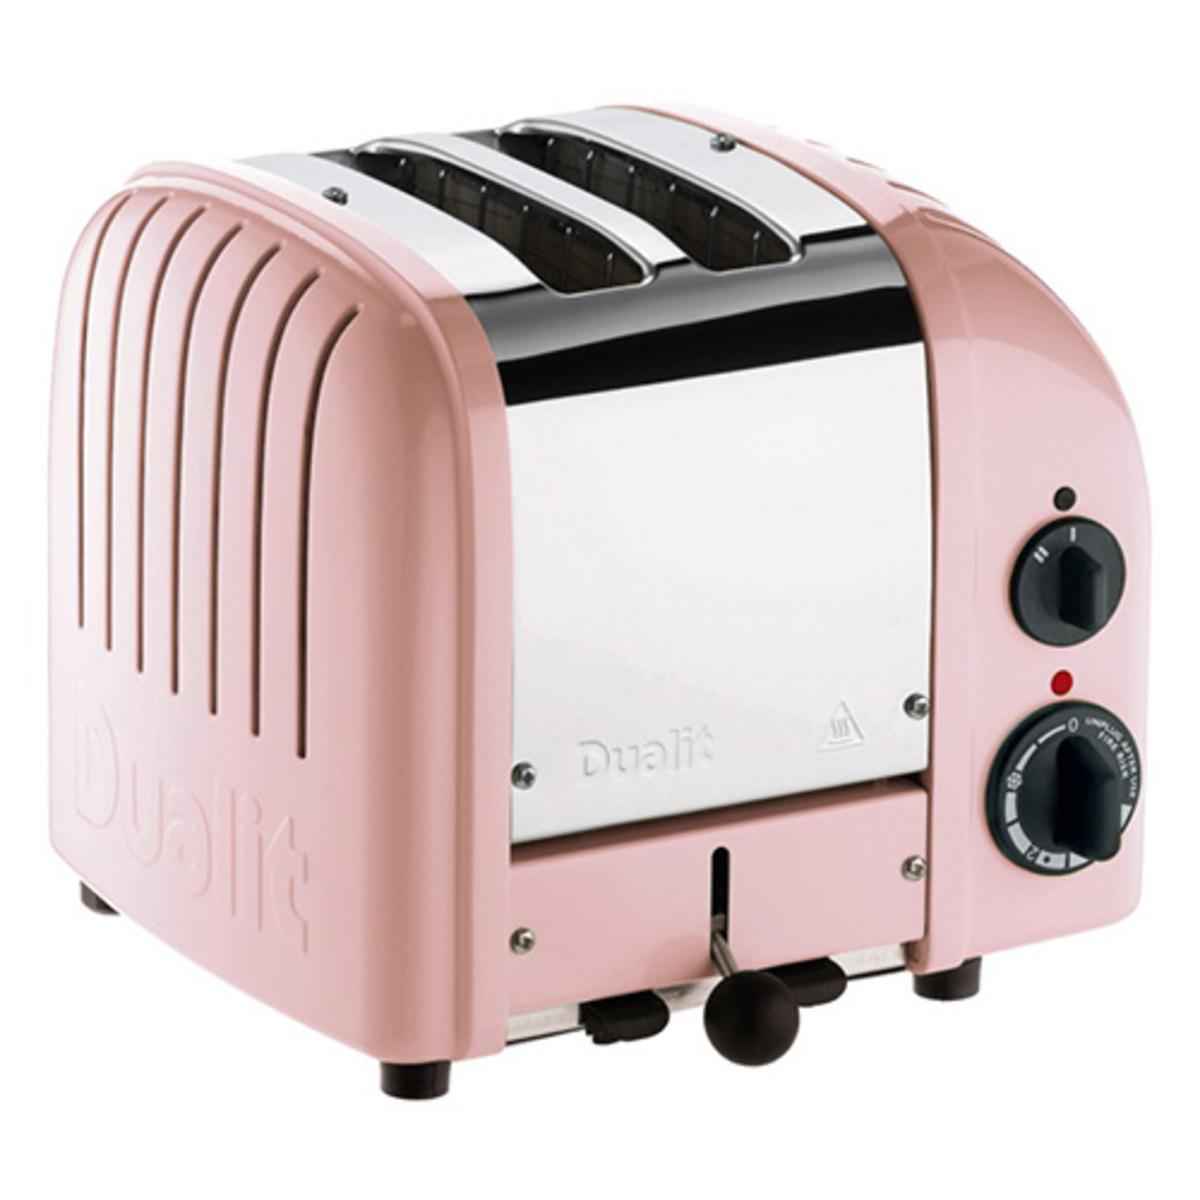 Image of Dualit 20440 Classic Vario AWS 2 Slot Toaster, Petal Pink